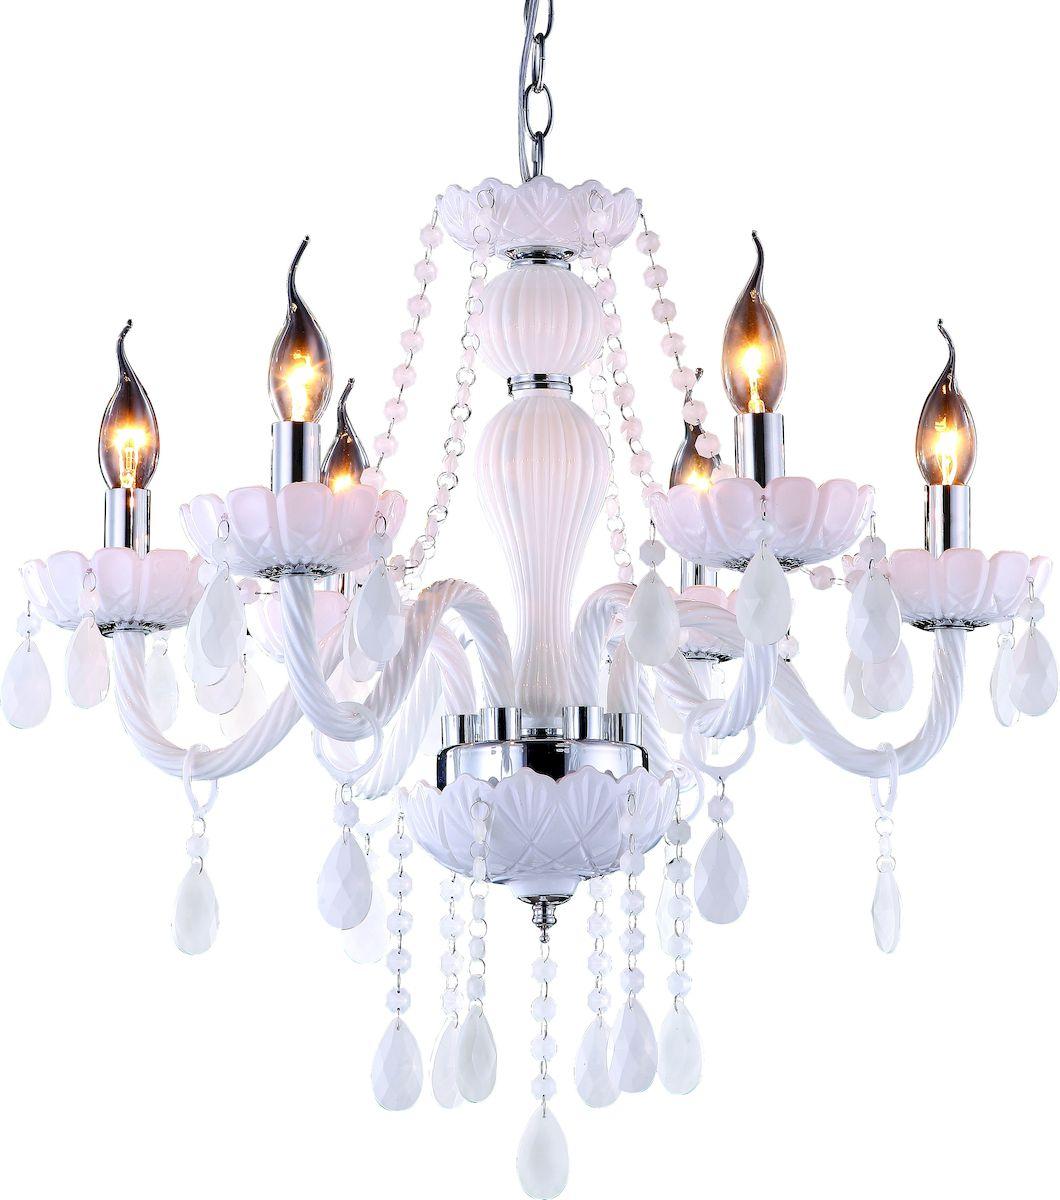 Светильник подвесной Arte Lamp Teatro A3964LM-6WHA3964LM-6WH